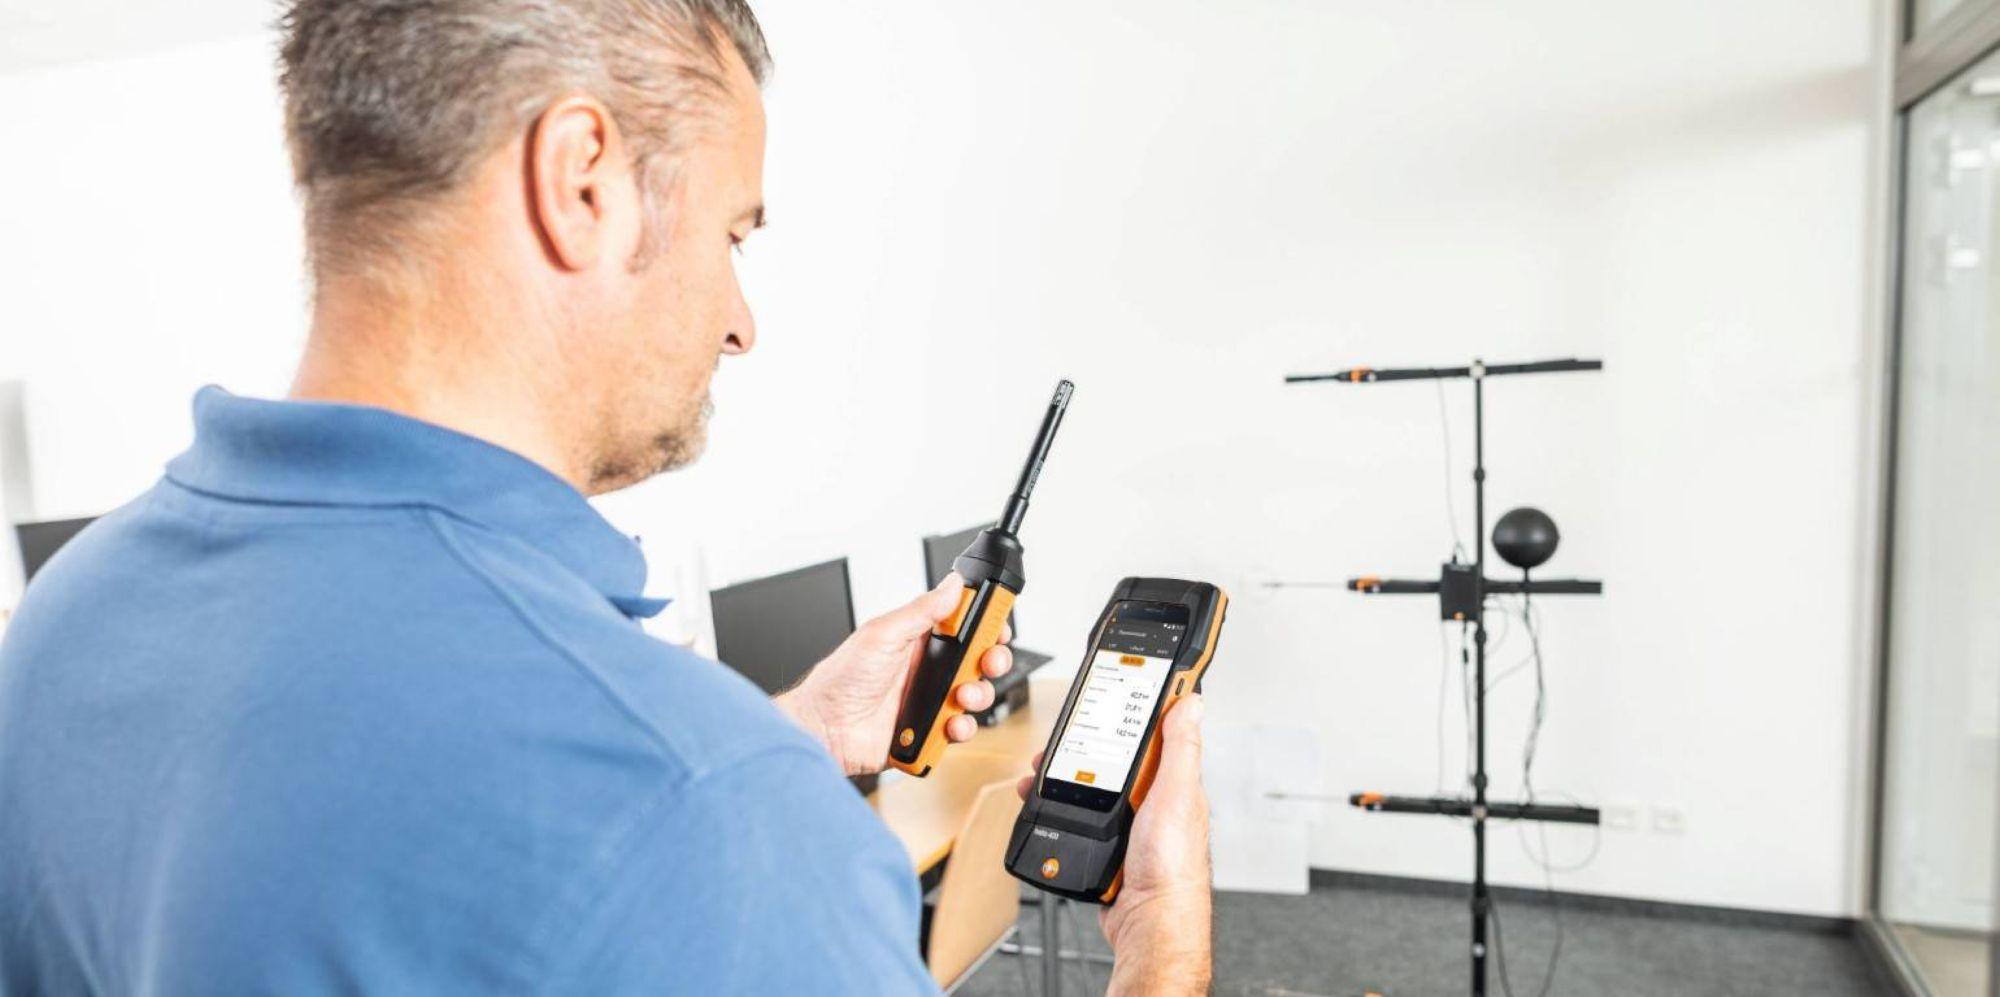 testo-400-0636-9731-thermohygrometer-probe-V4-DE_teaser.jpg